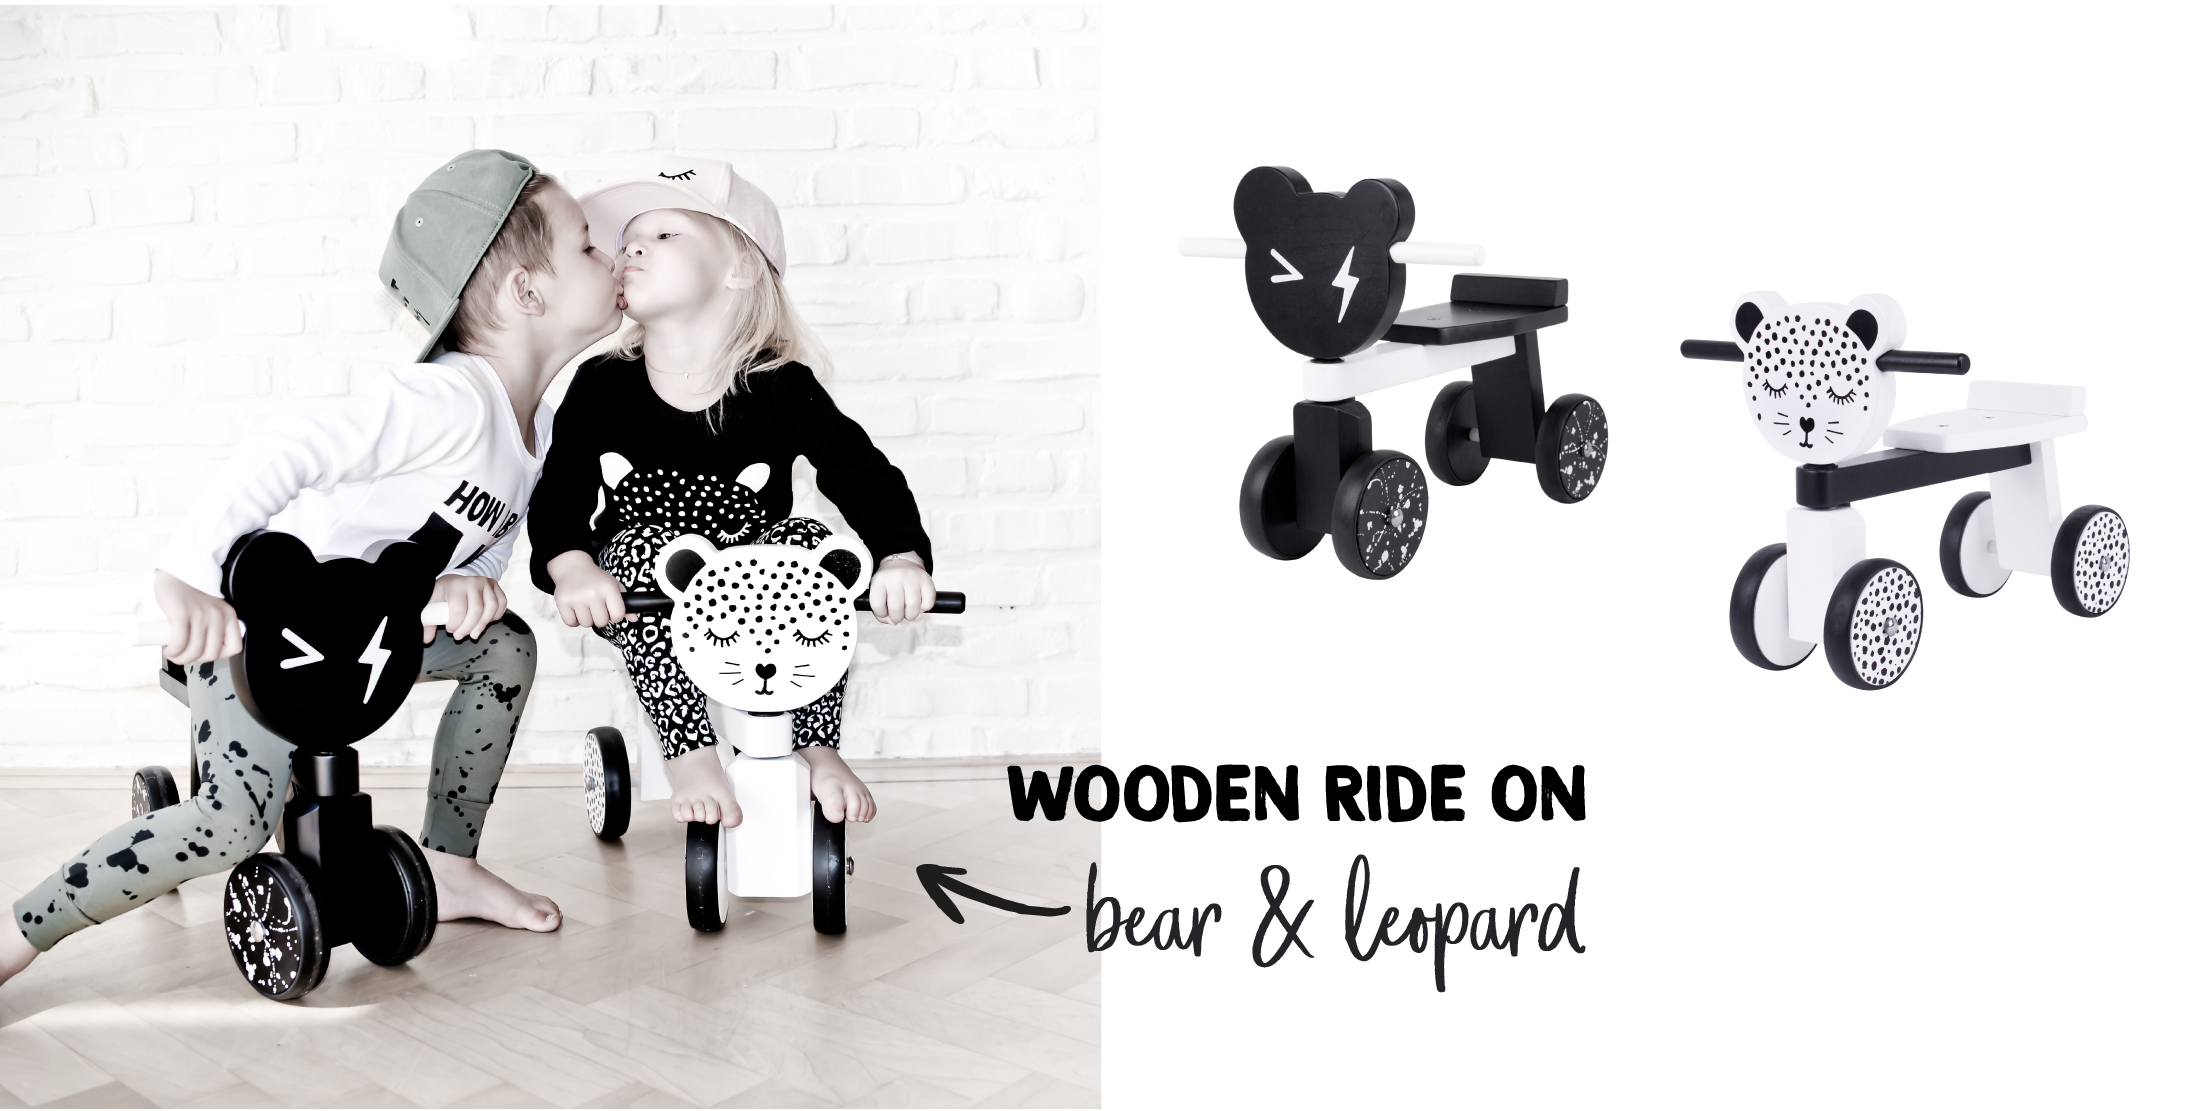 Wooden Ride On vanPauline